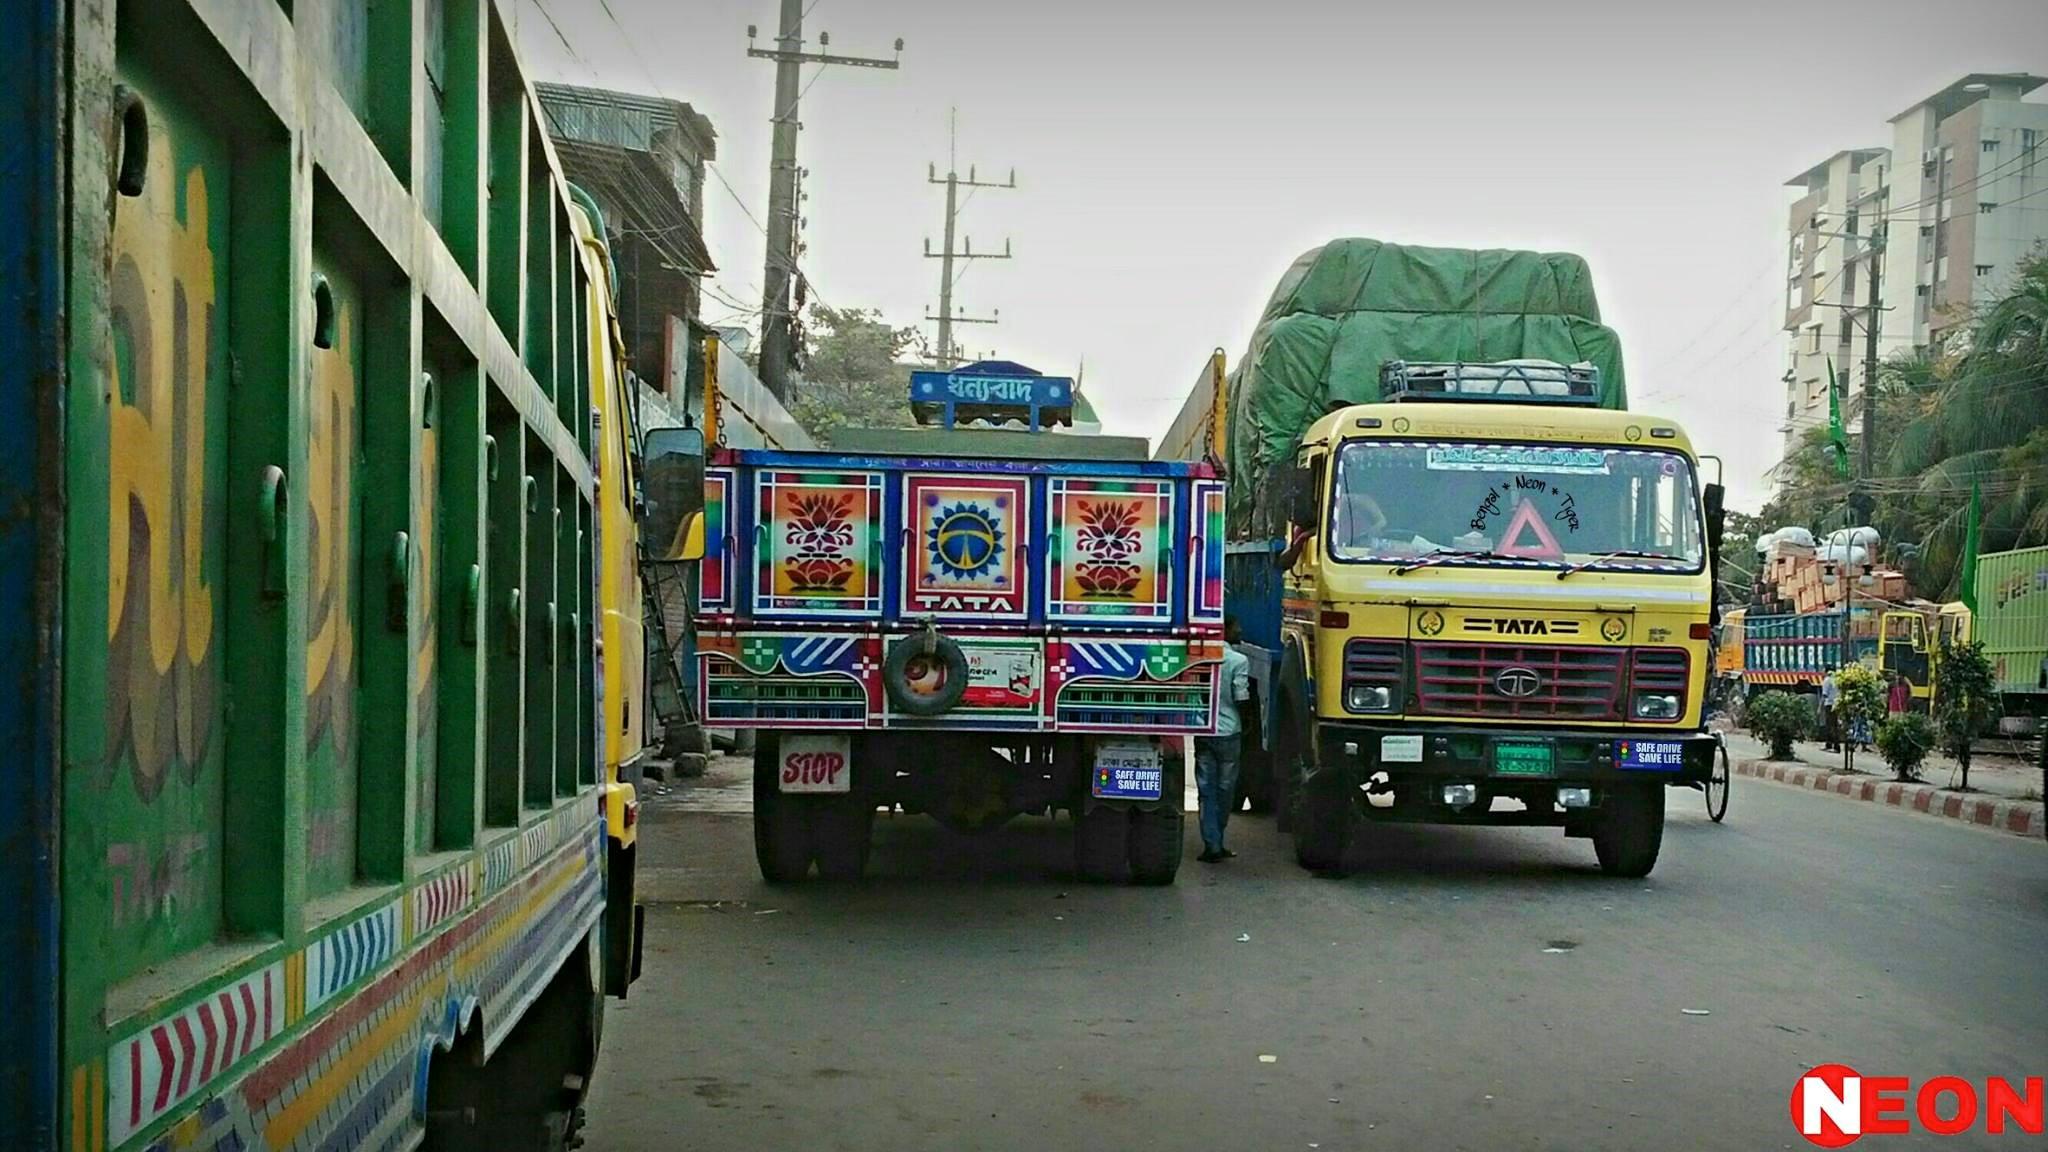 TATA-1615-Dhaka-Majhirghat-Road-Chaittagong